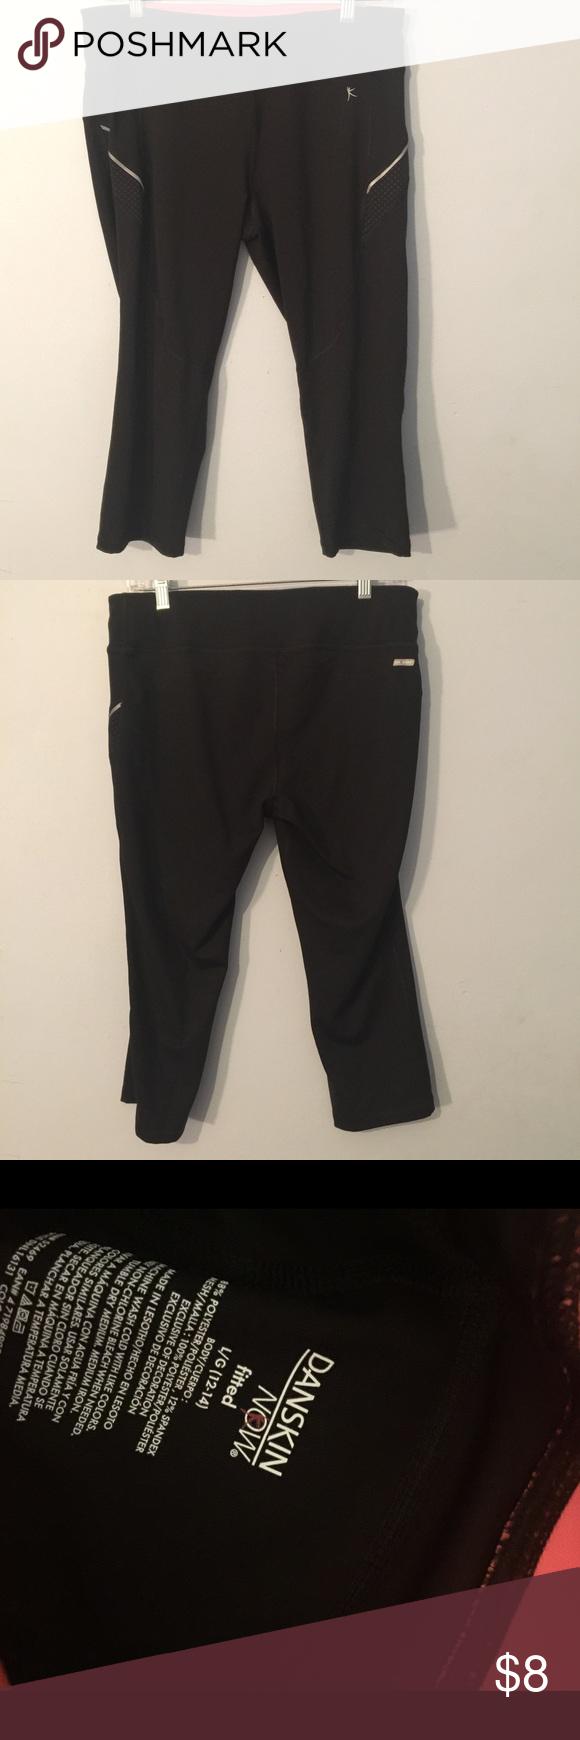 Danskin leggings size L Danskin leggings size L Danskin Pants Track Pants & Joggers